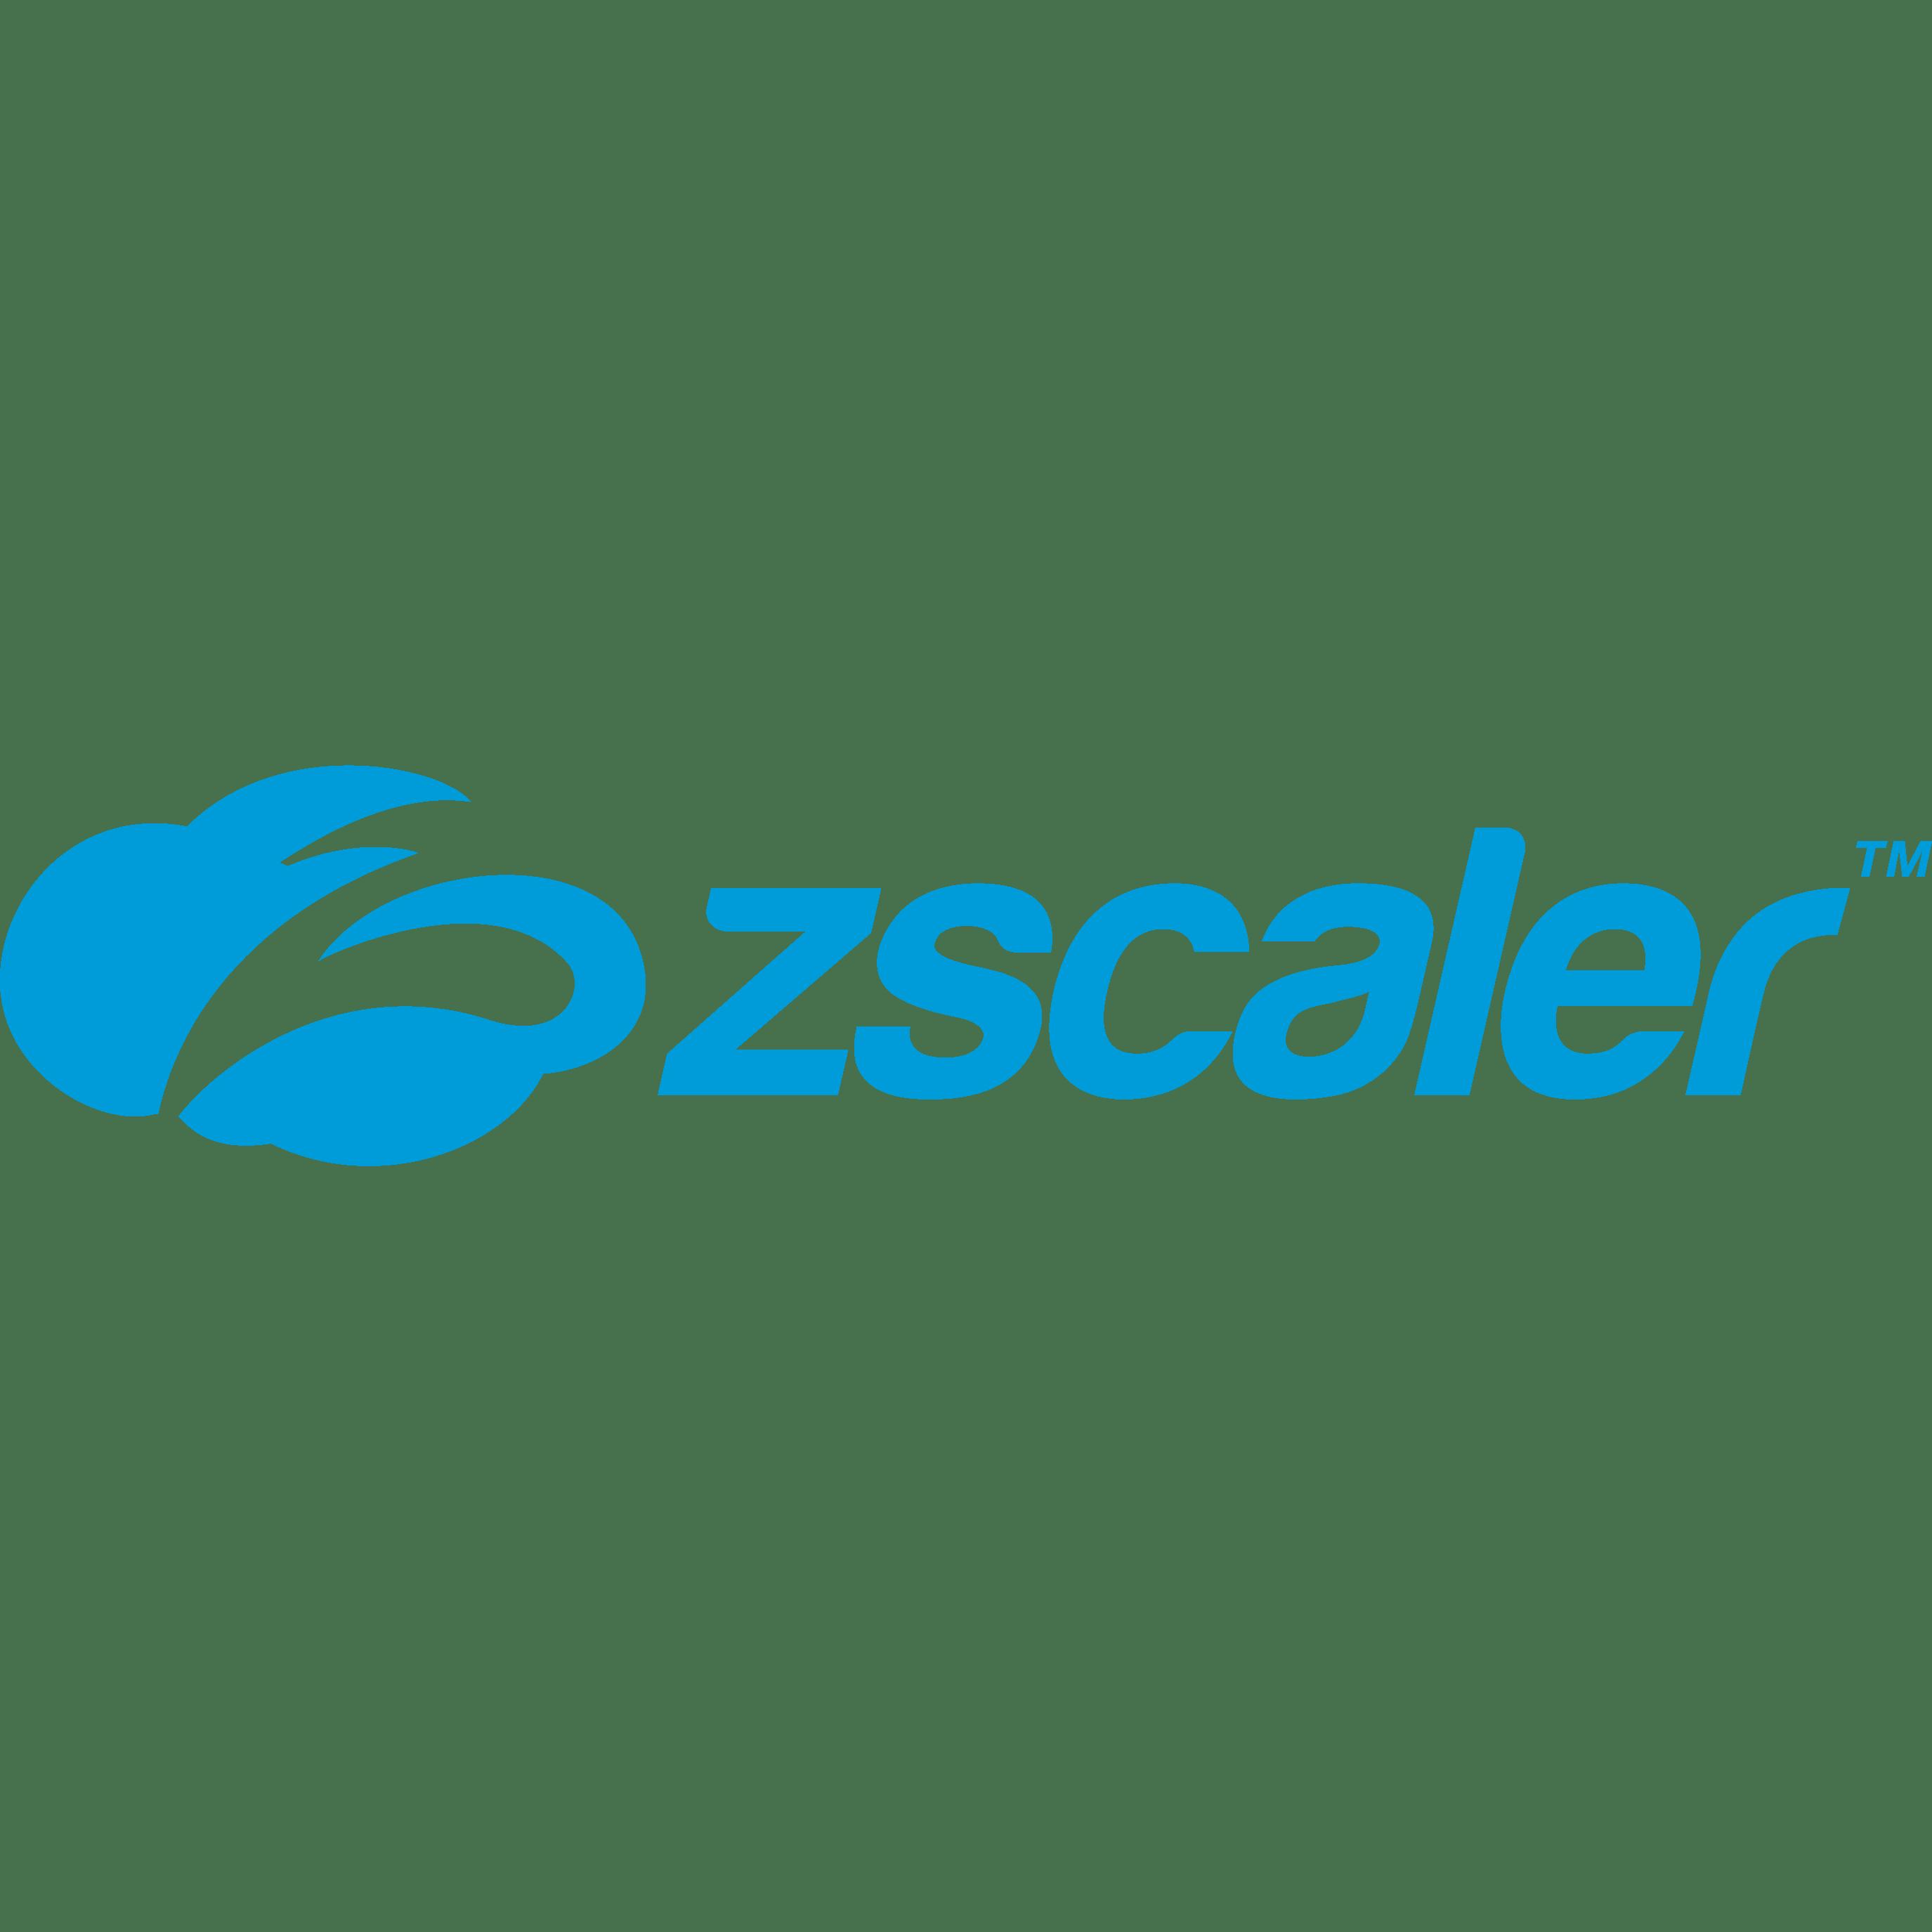 Zscaler Aktienanalyse | Bilanzanalyse - Fundamentale Aktienanalyse